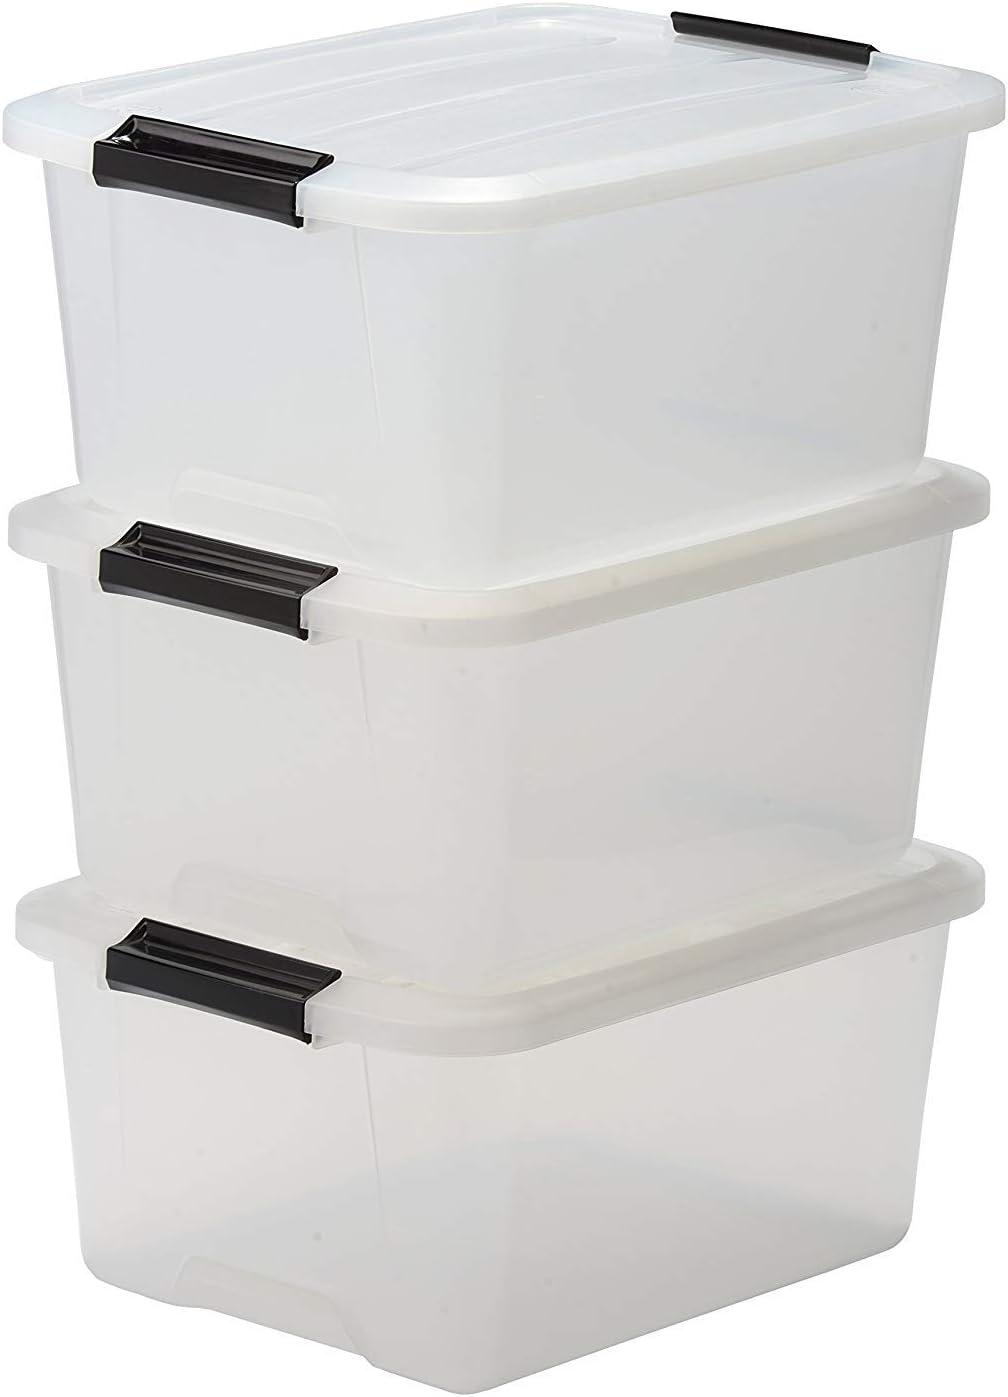 3 x Aufbewahrungs Box mit Deckel 60 L Kunststoff Stau Korb Stapel Spiel Kiste